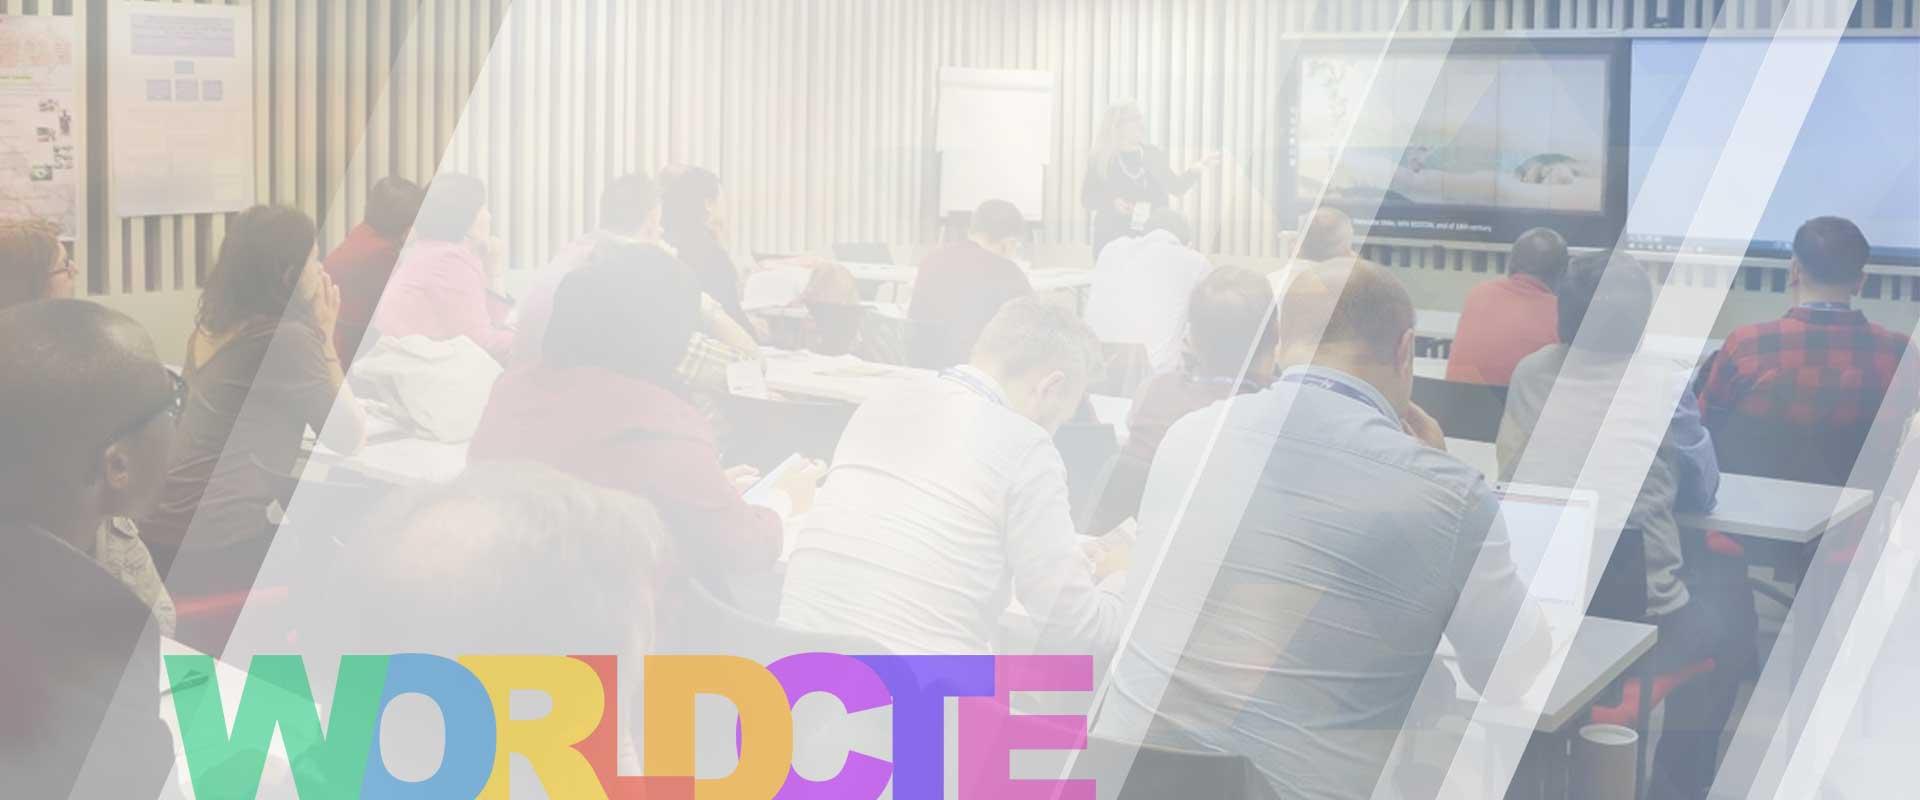 worldcte-Slider